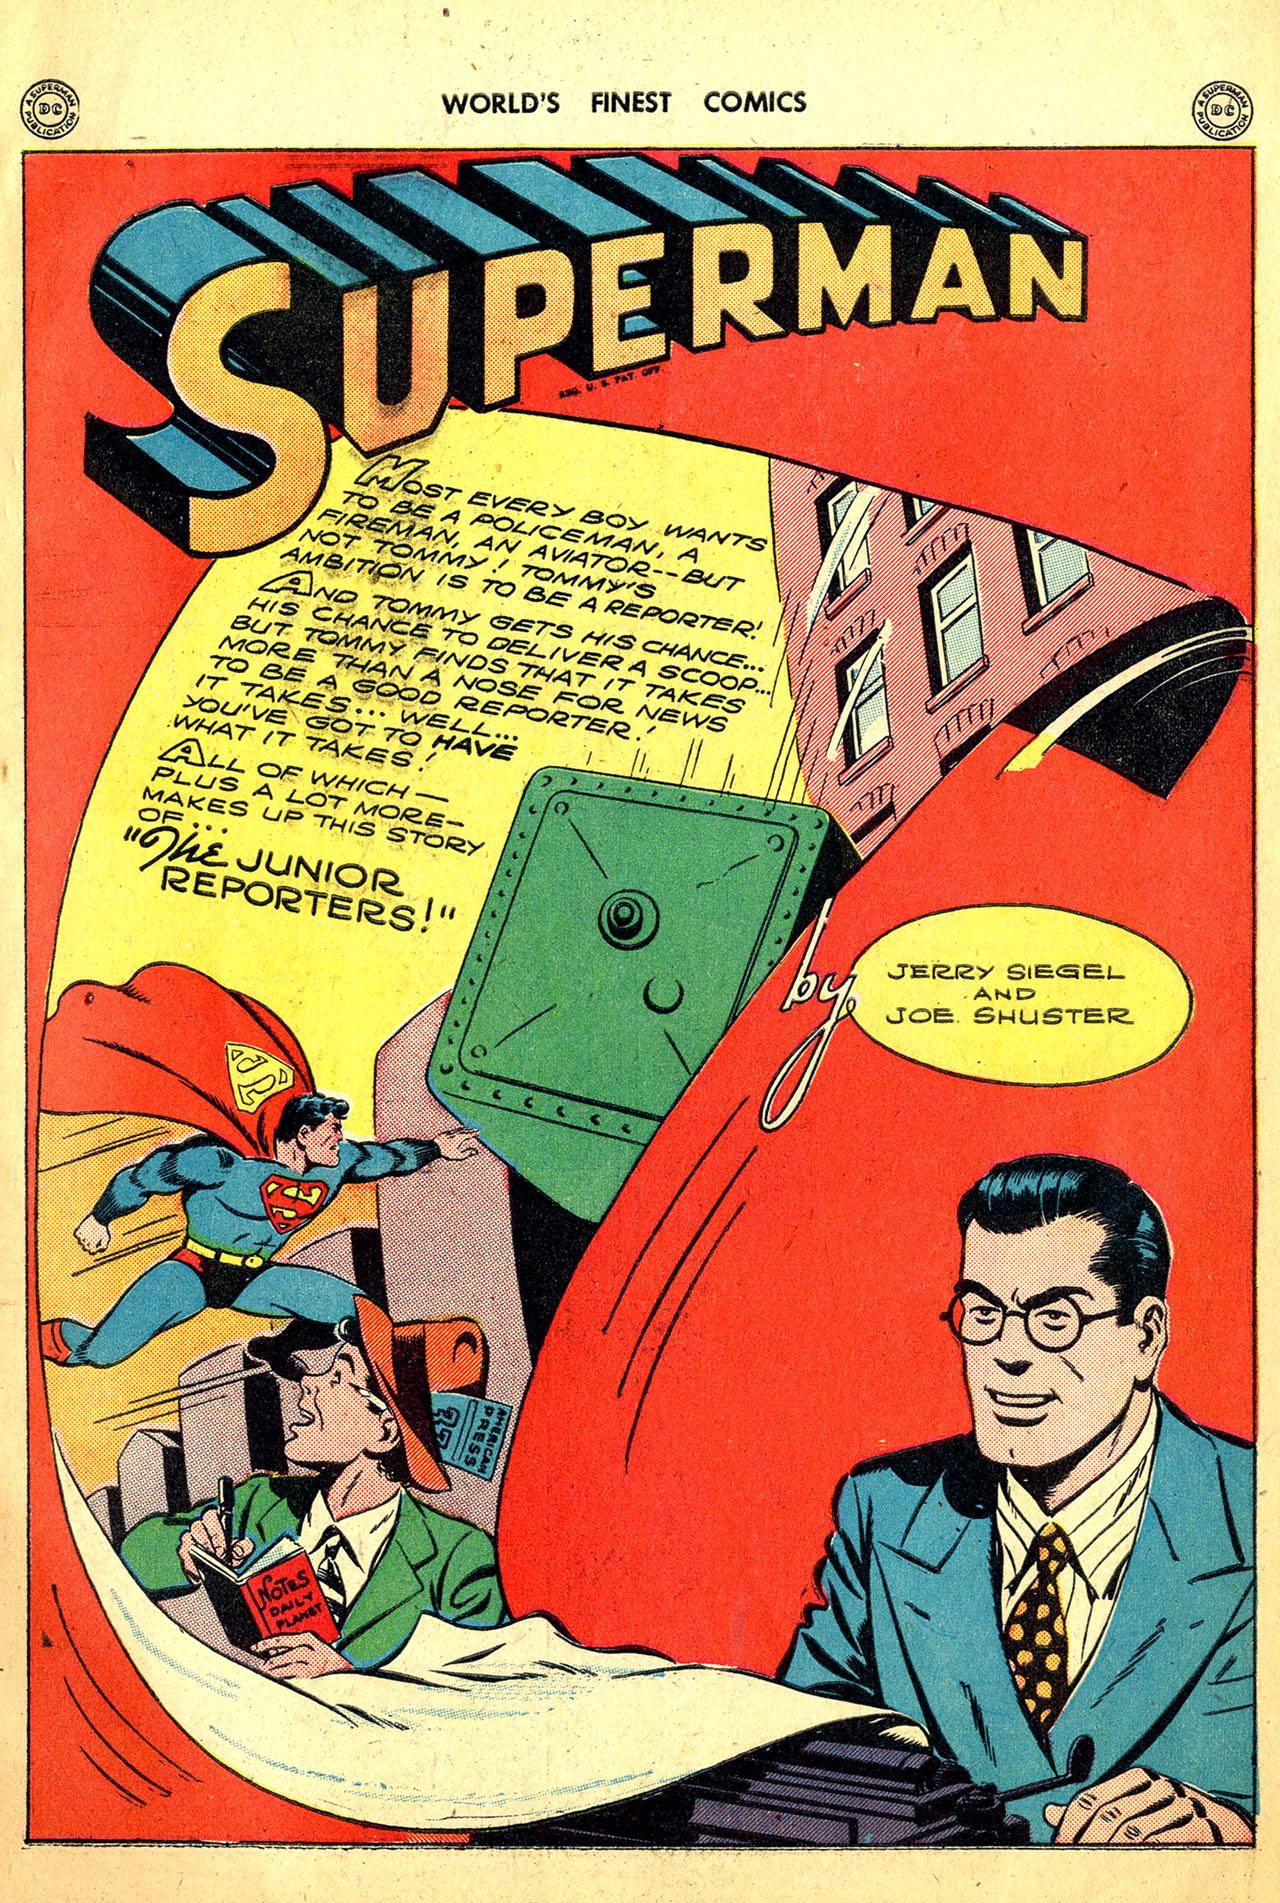 Read online World's Finest Comics comic -  Issue #18 - 3